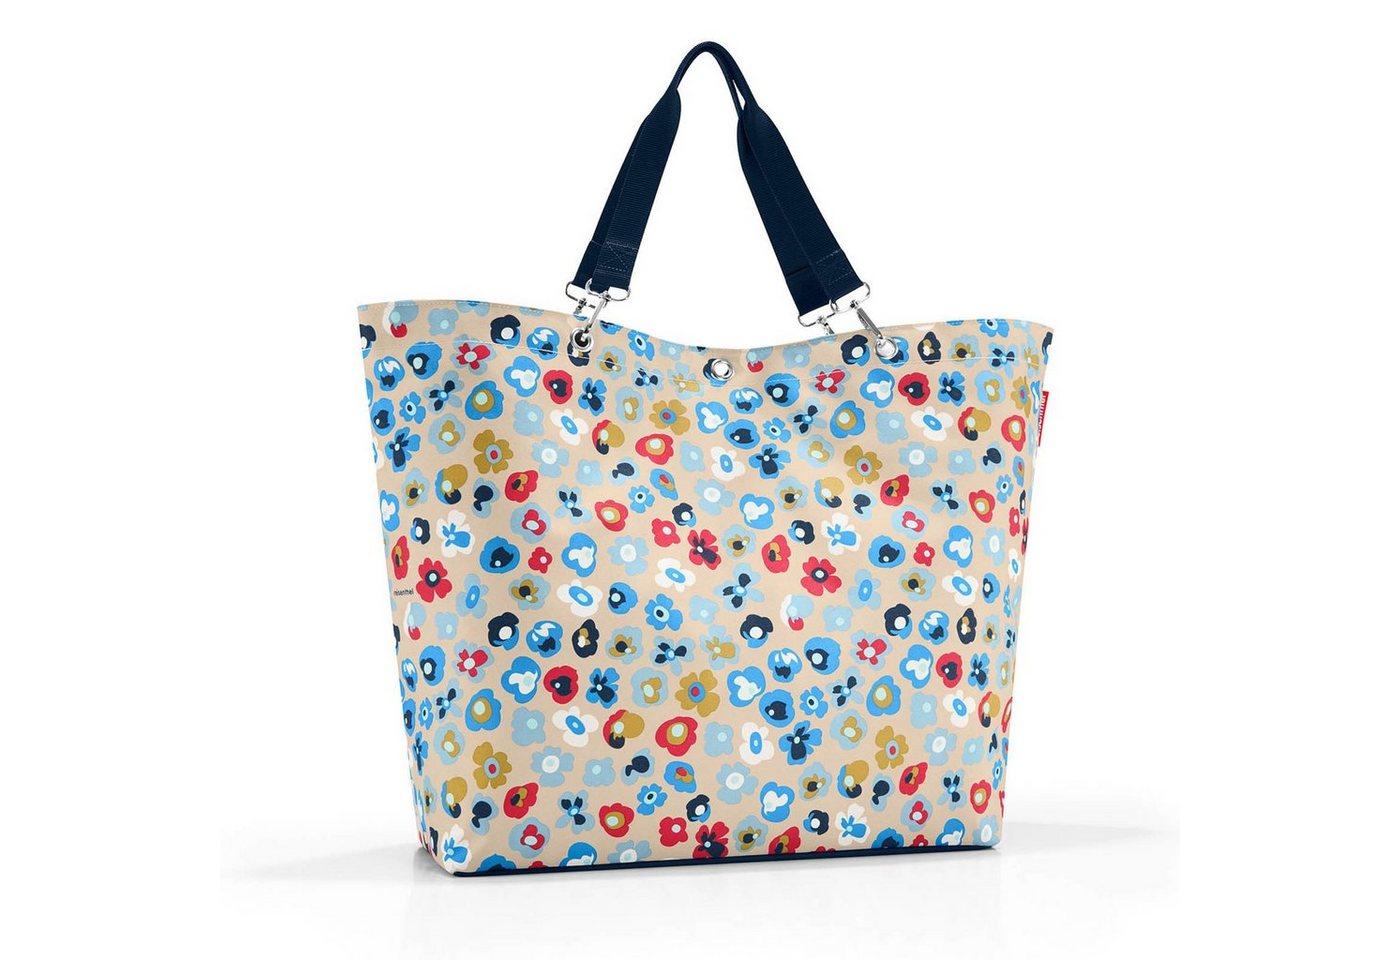 Damen REISENTHEL® Strandtasche »shopper XL«    04012013701269